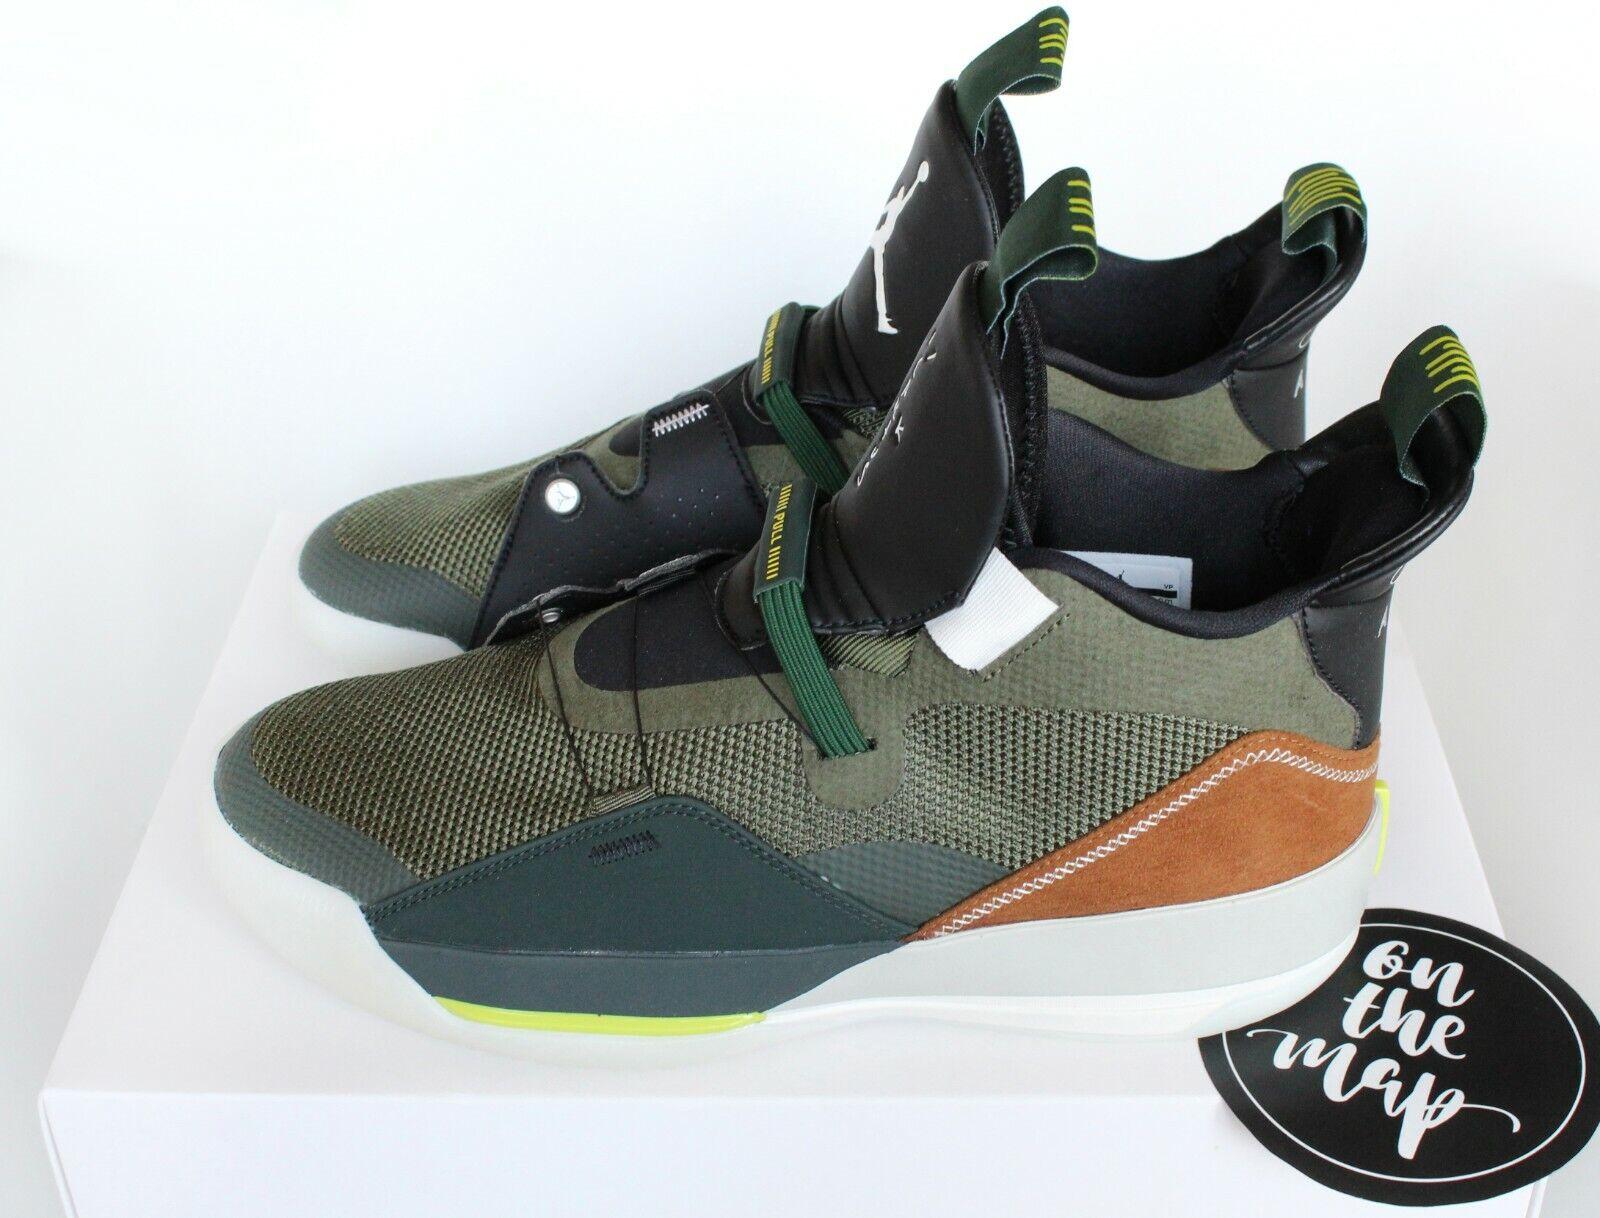 Nike Air Jordan 33 x Travis Scott NRG Olive Green Cactus Jack New